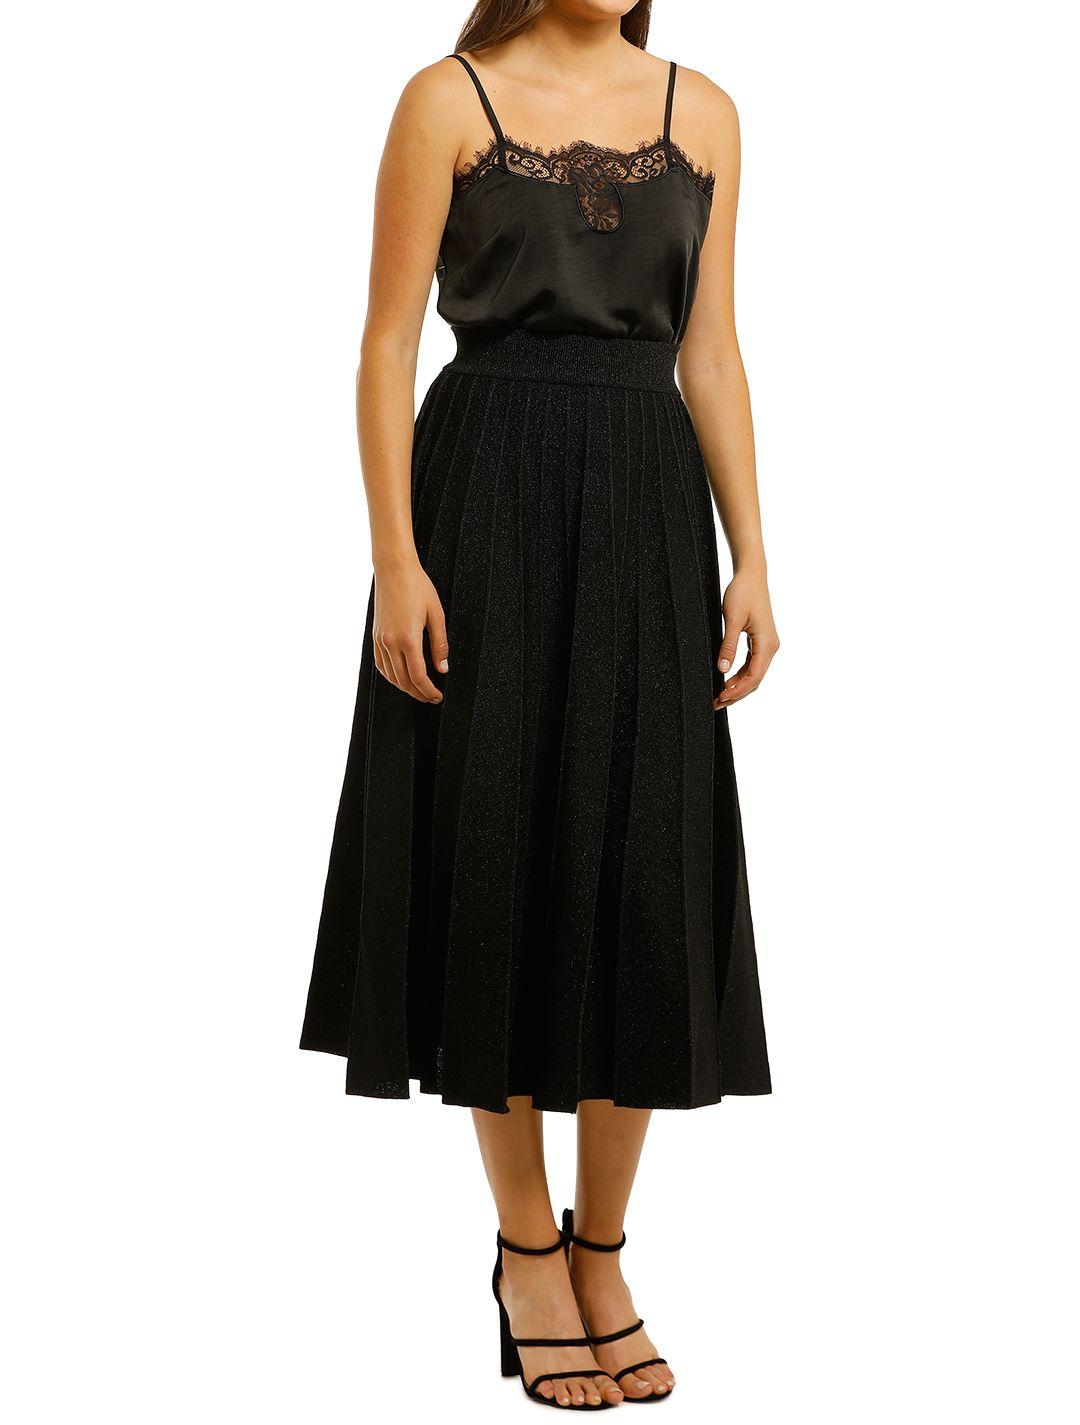 Vestire-Just-A-Little-Crush-Midi-Skirt-Black-Side